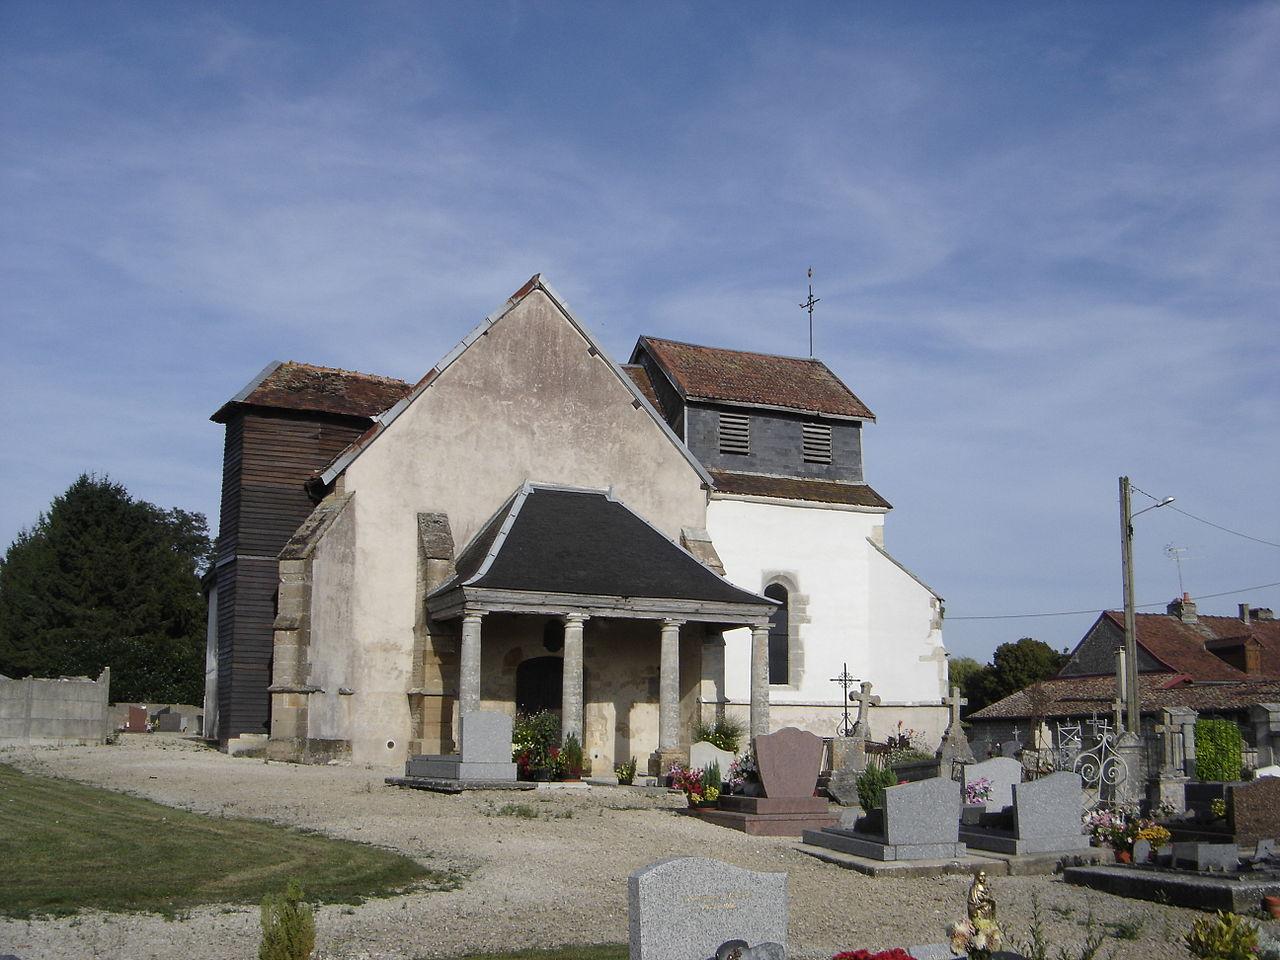 Radonvilliers Eglise1.JPG